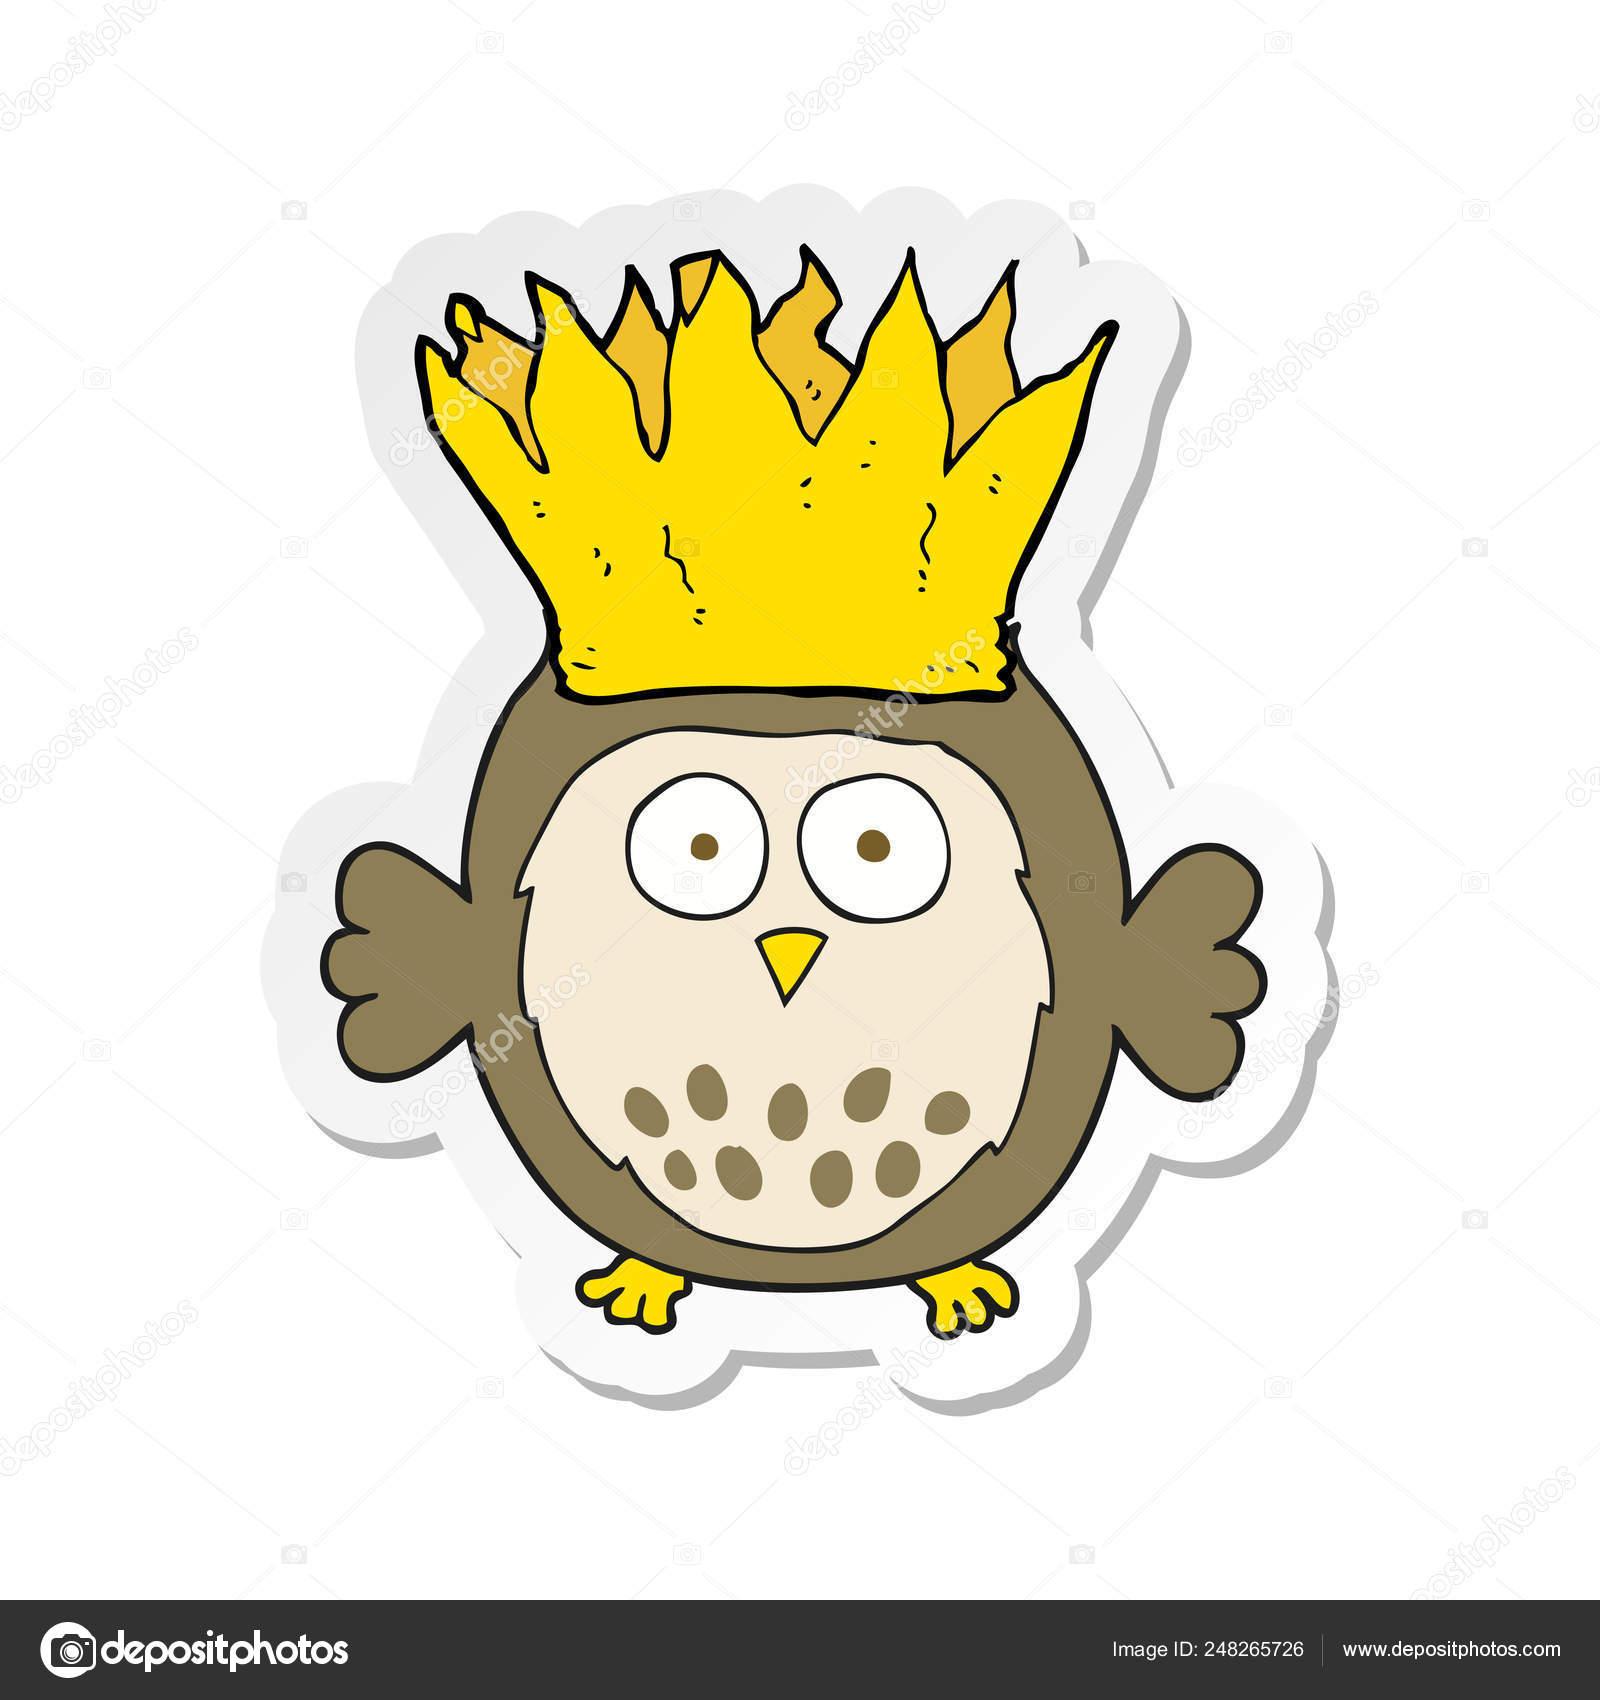 Sticker Cartoon Owl Wearing Paper Crown Christmas Hat Stock Vector C Lineartestpilot 248265726 42,000+ vectors, stock photos & psd files. https depositphotos com 248265726 stock illustration sticker cartoon owl wearing paper html